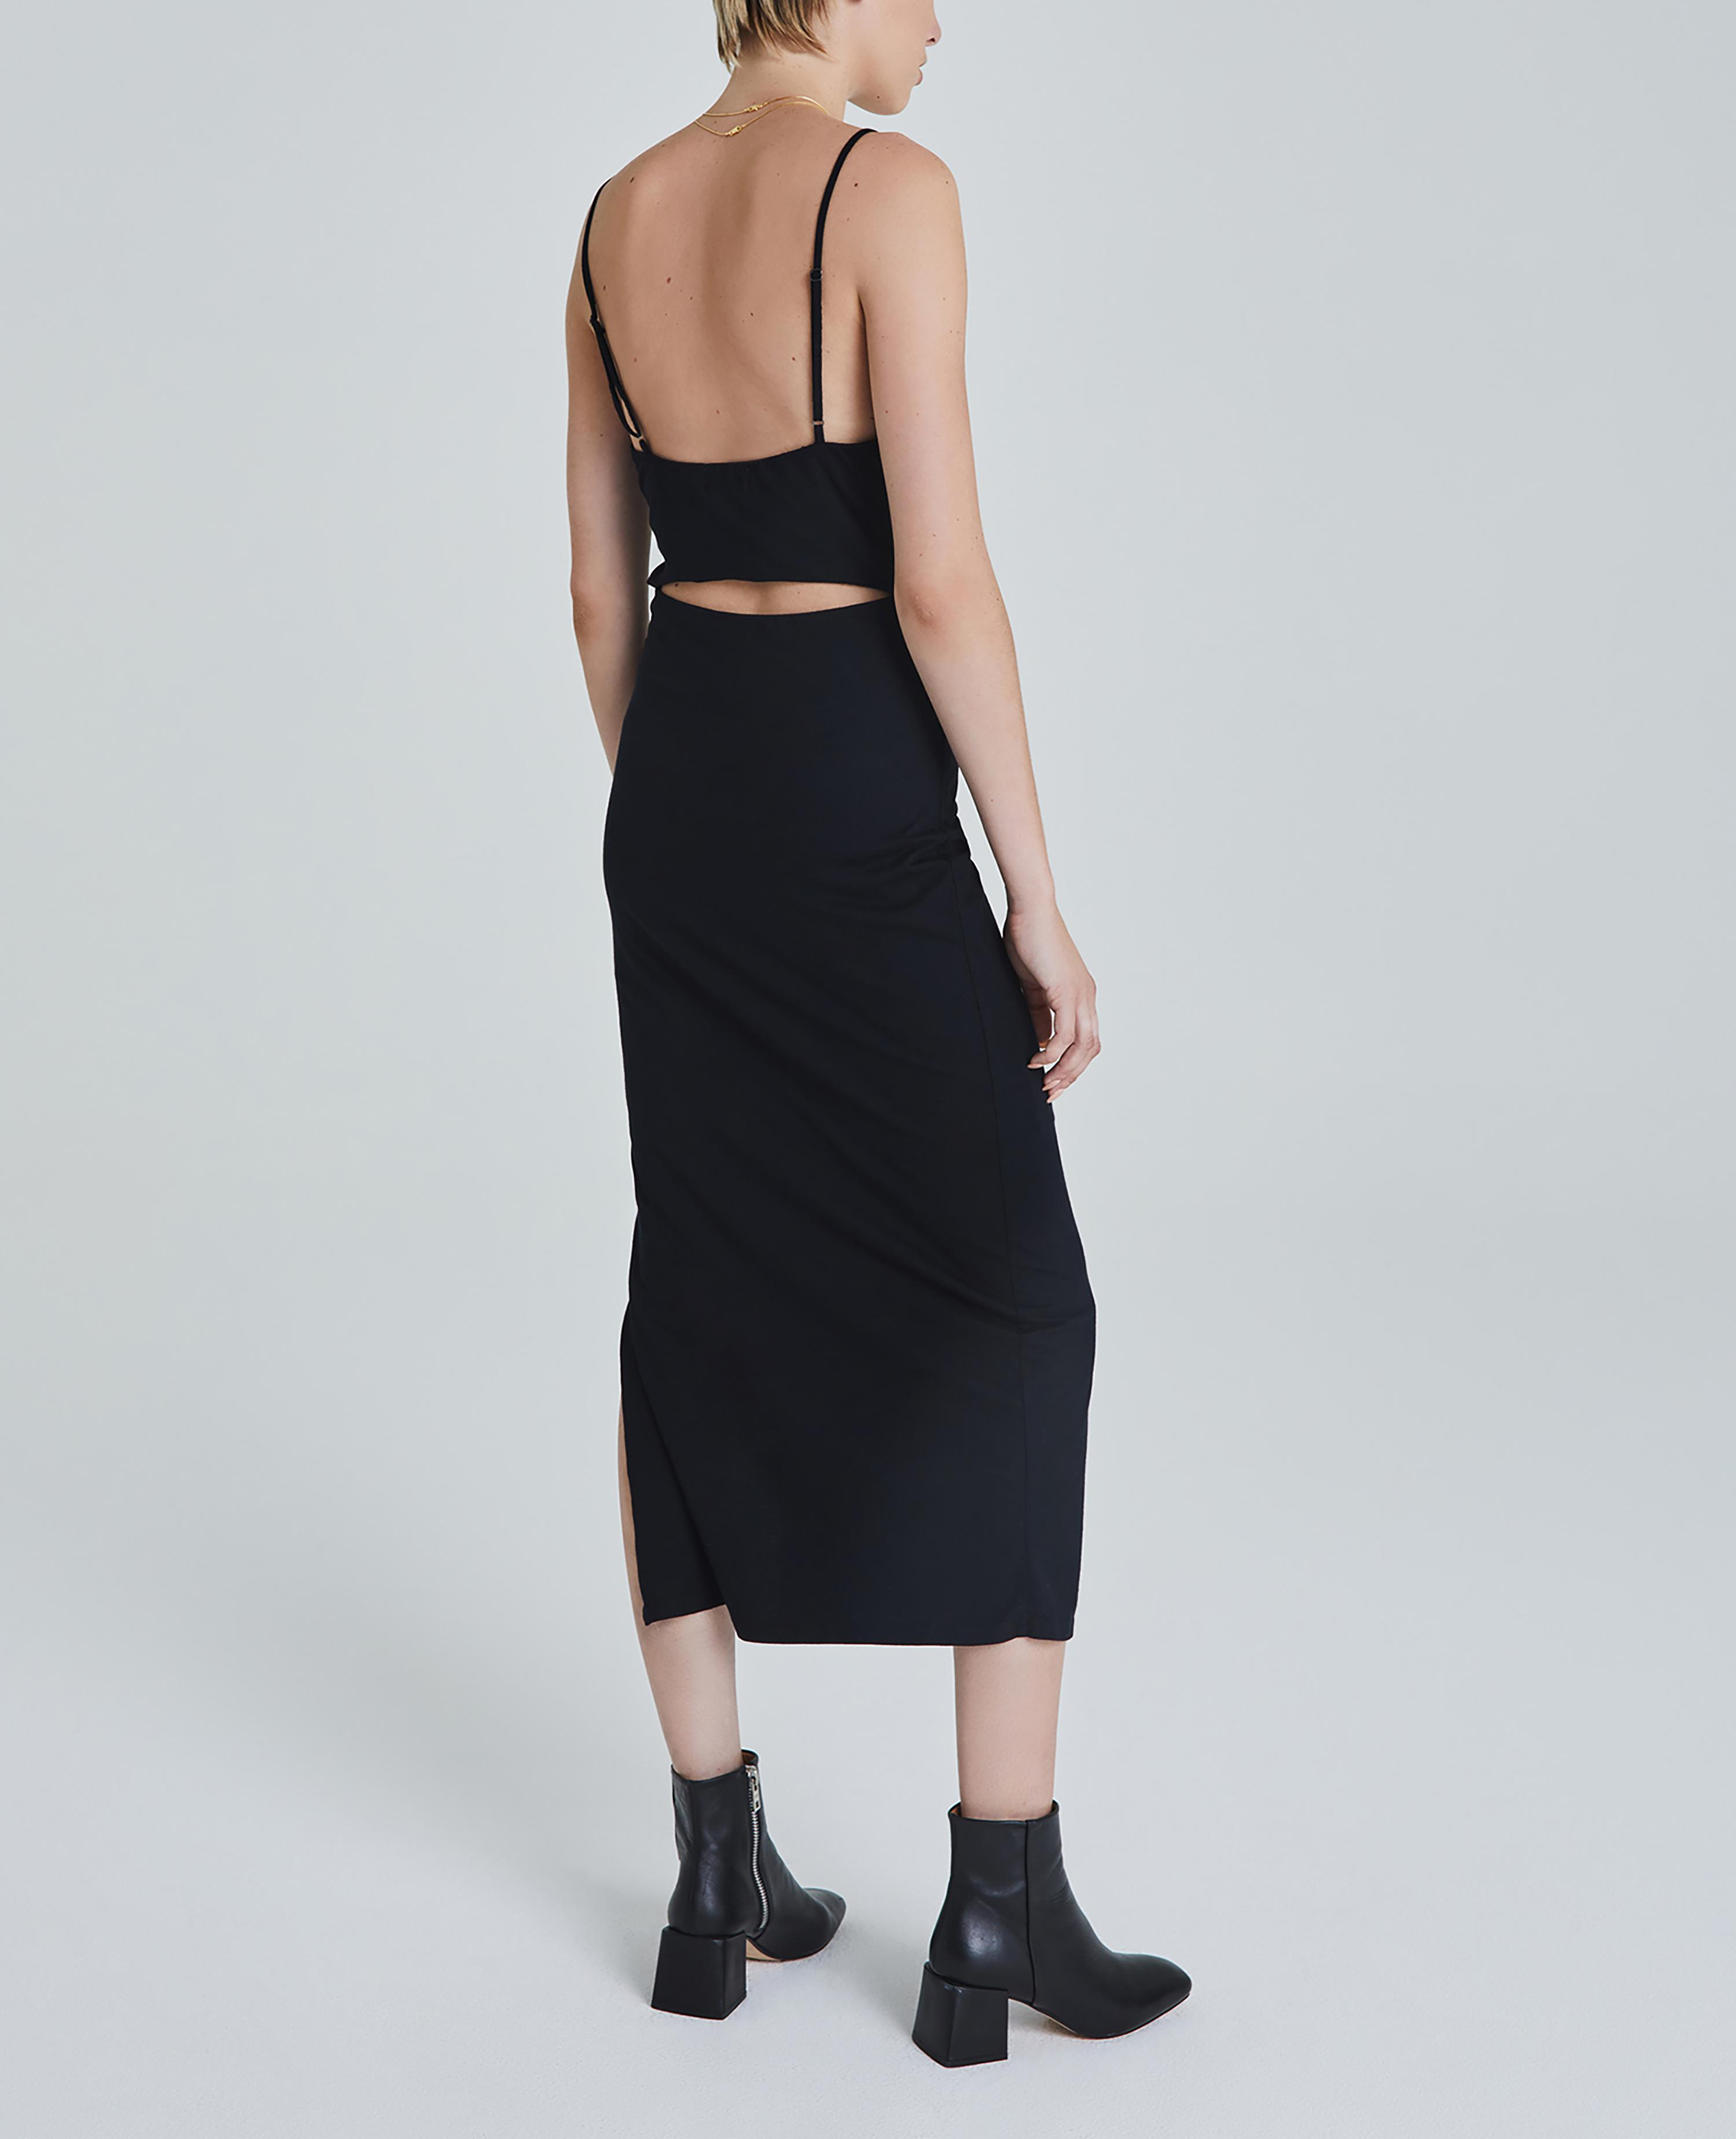 The Quail Dress